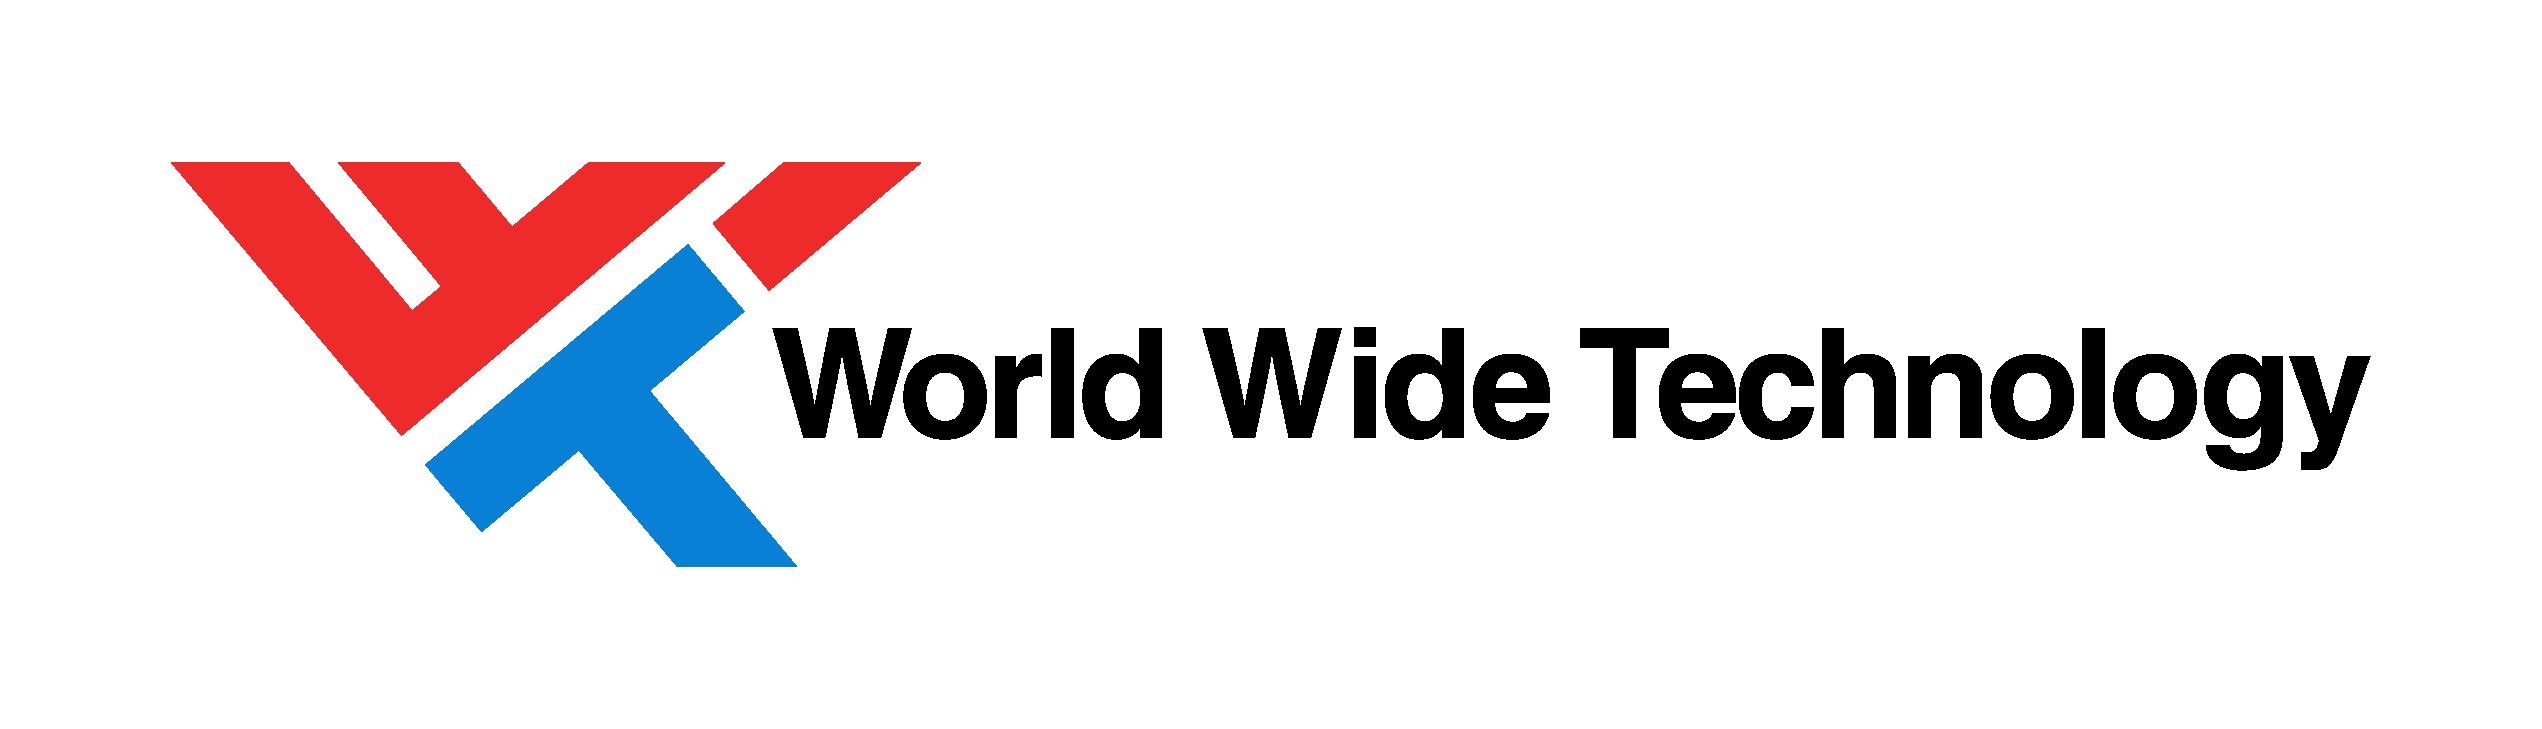 Logo for World Wide Technology